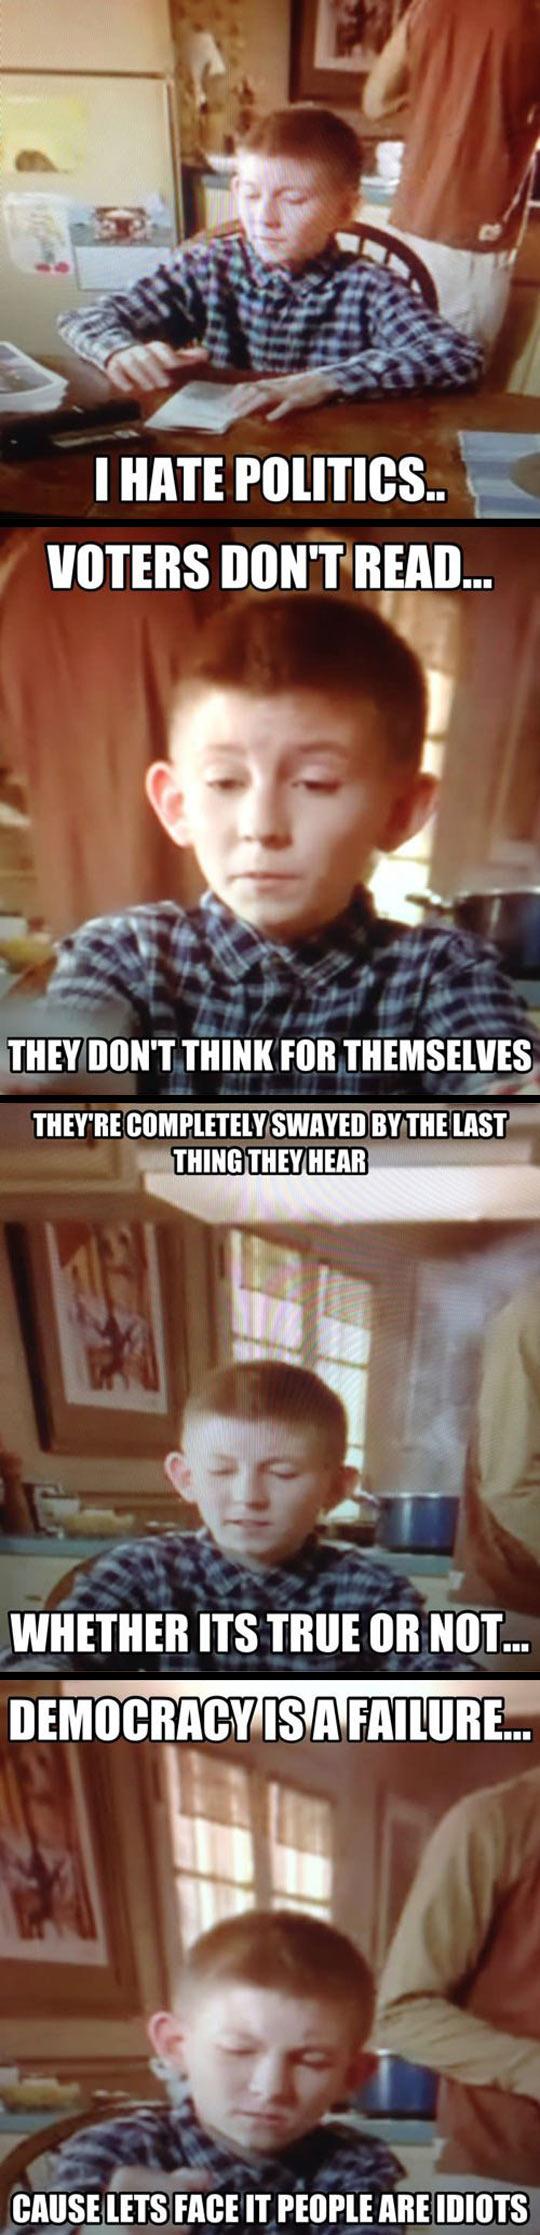 Dewey should be president…